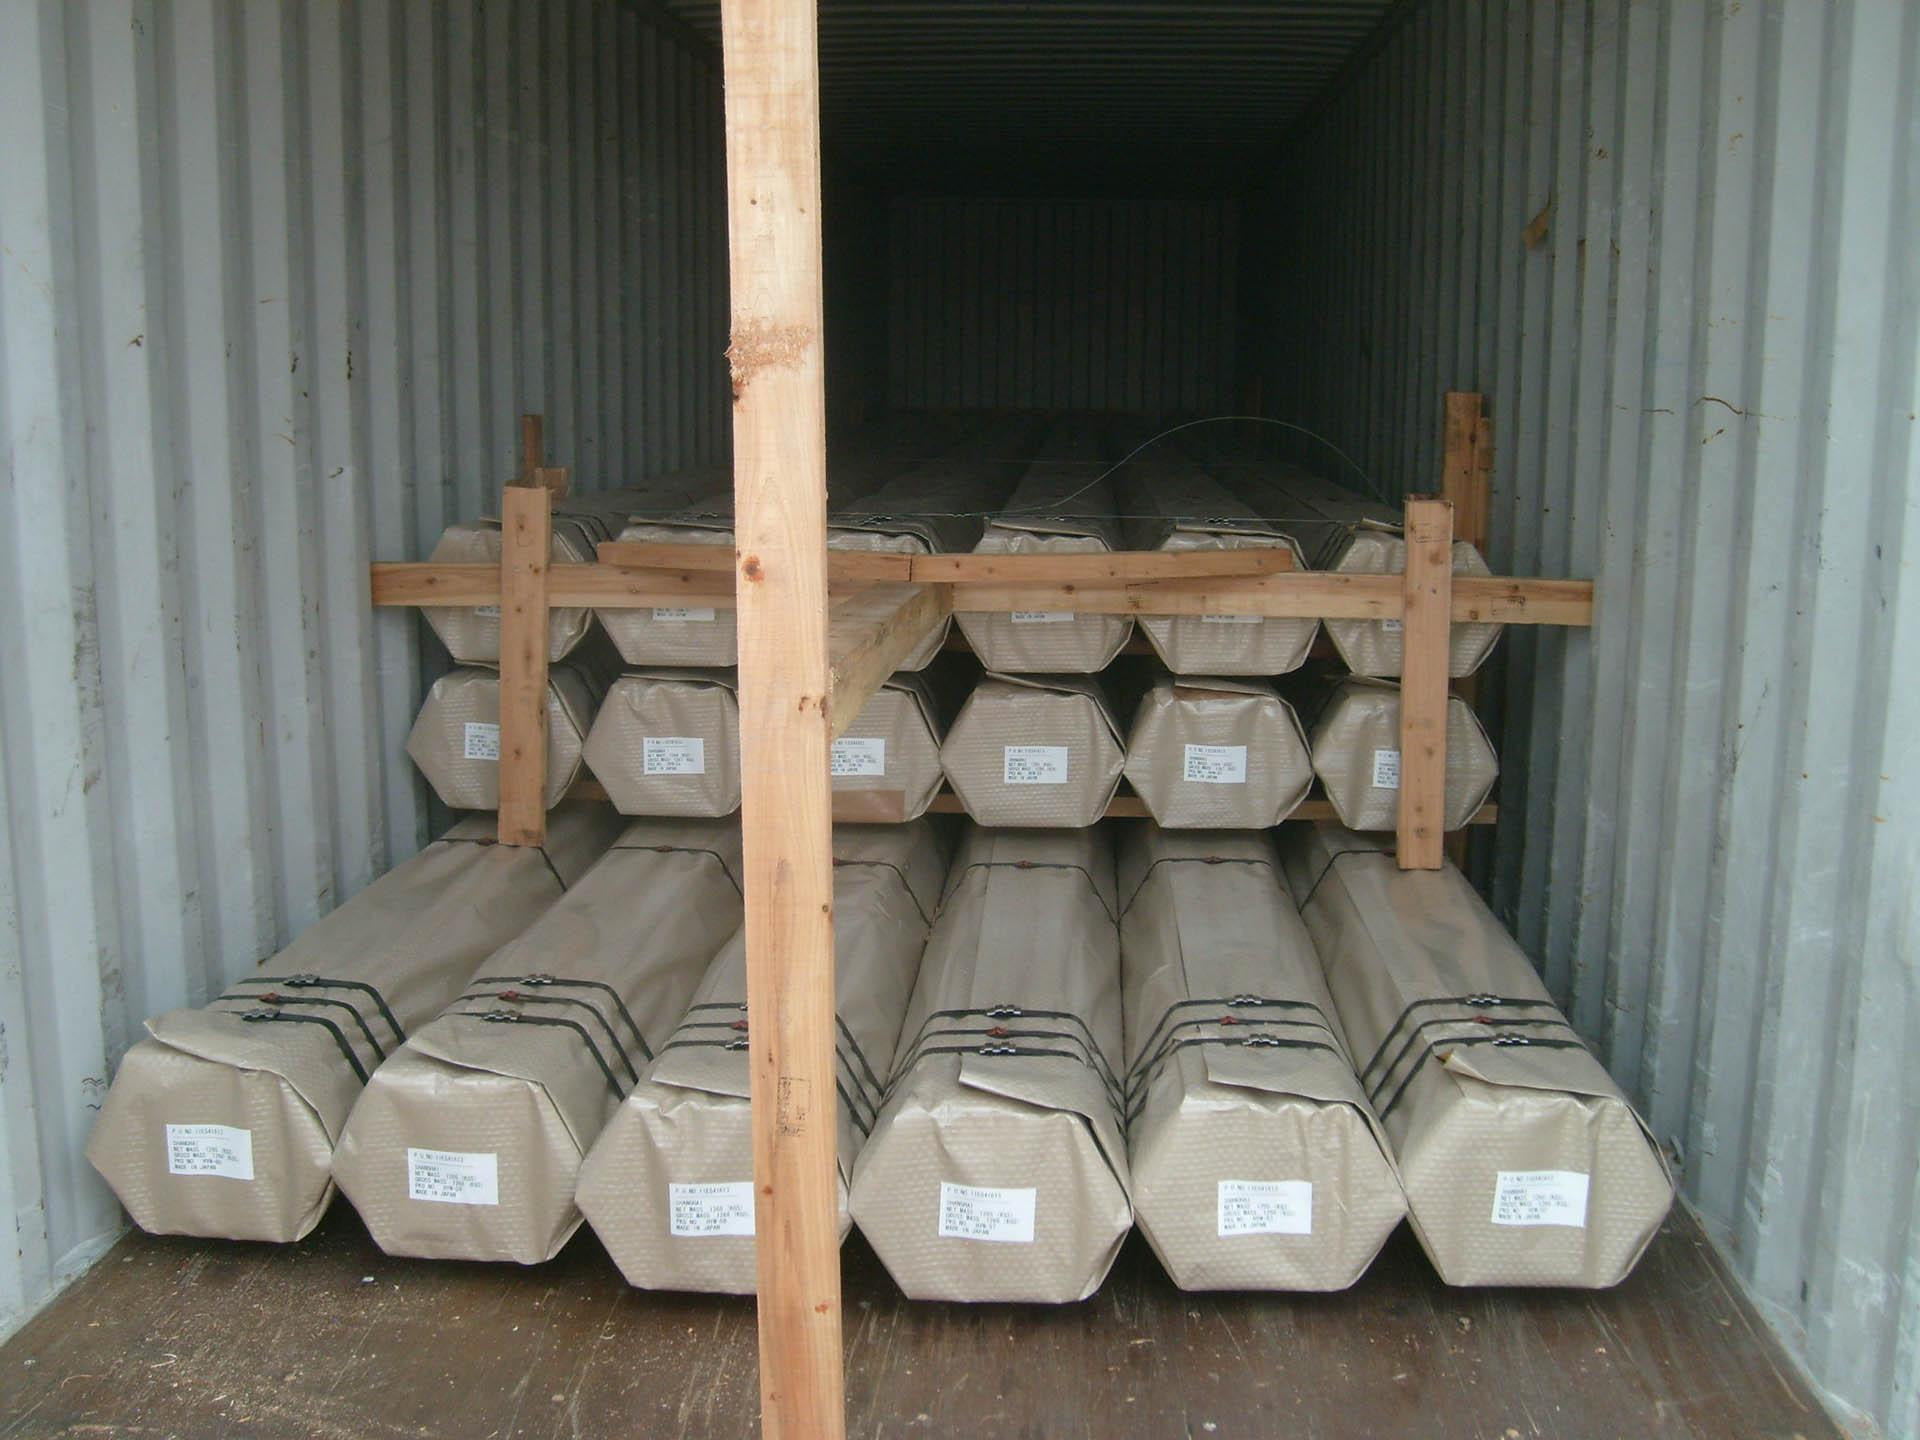 Unloading 9